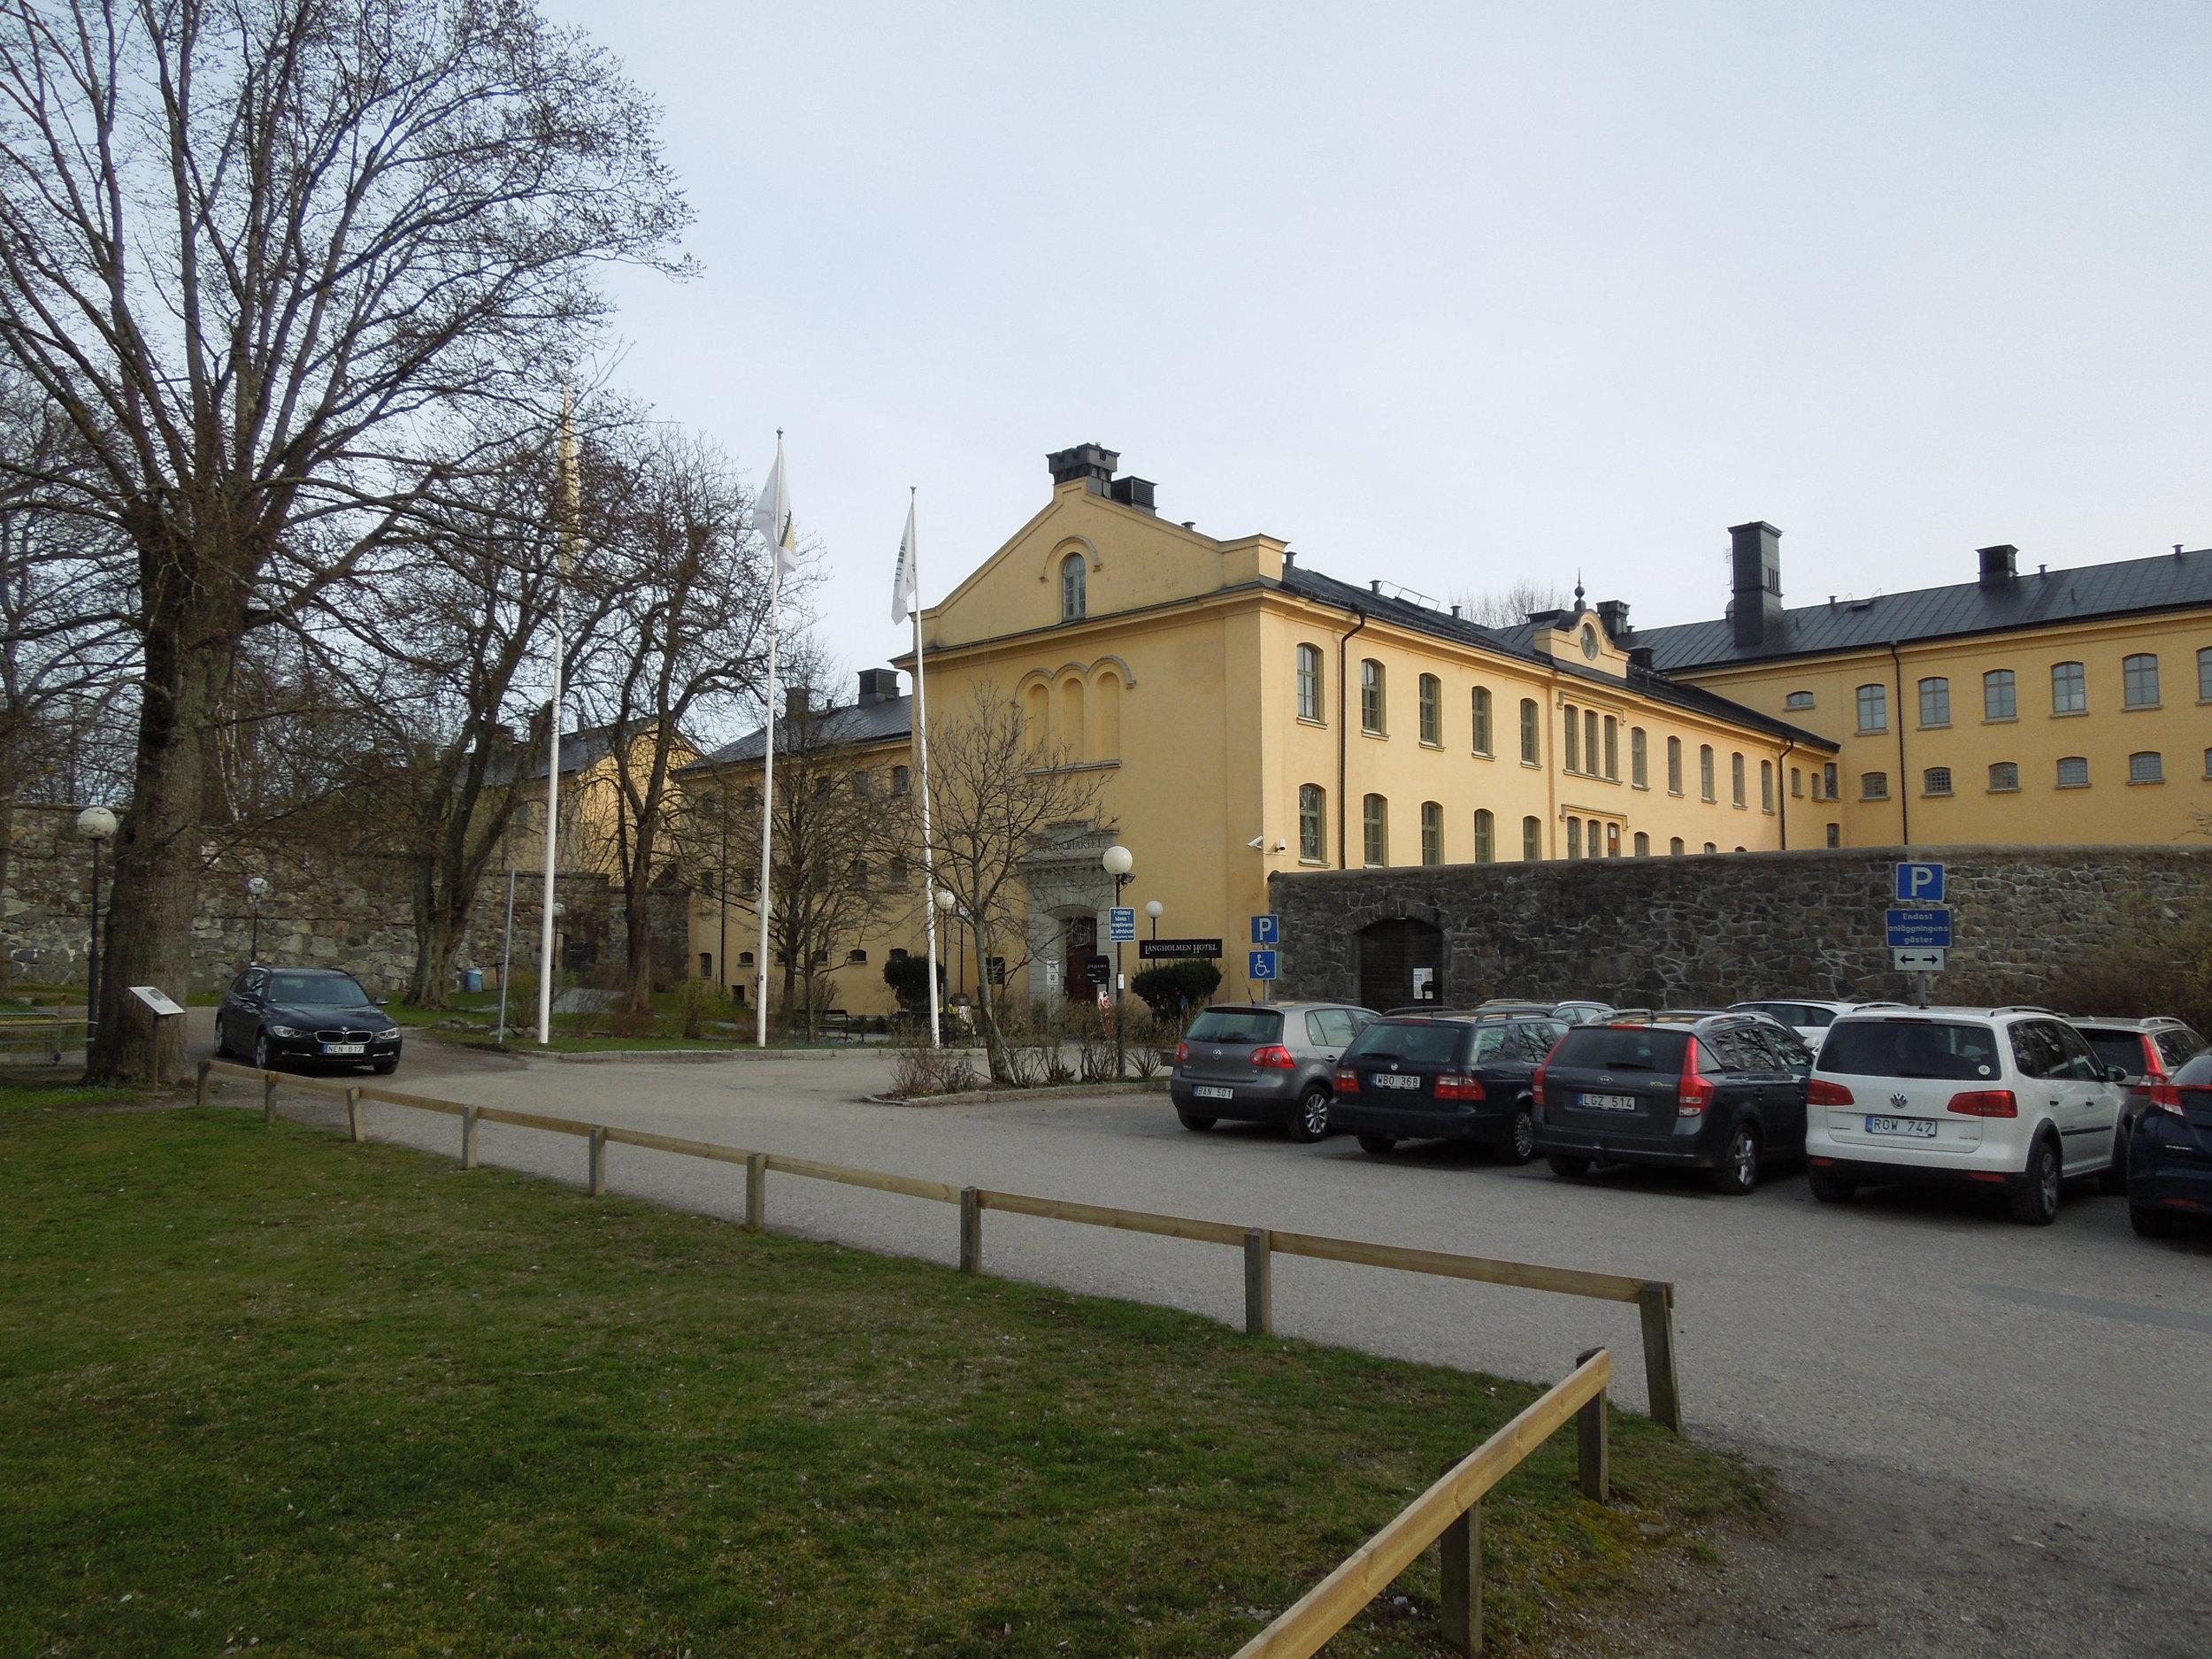 Hostel I am staying at. Långholmen, formally a prison